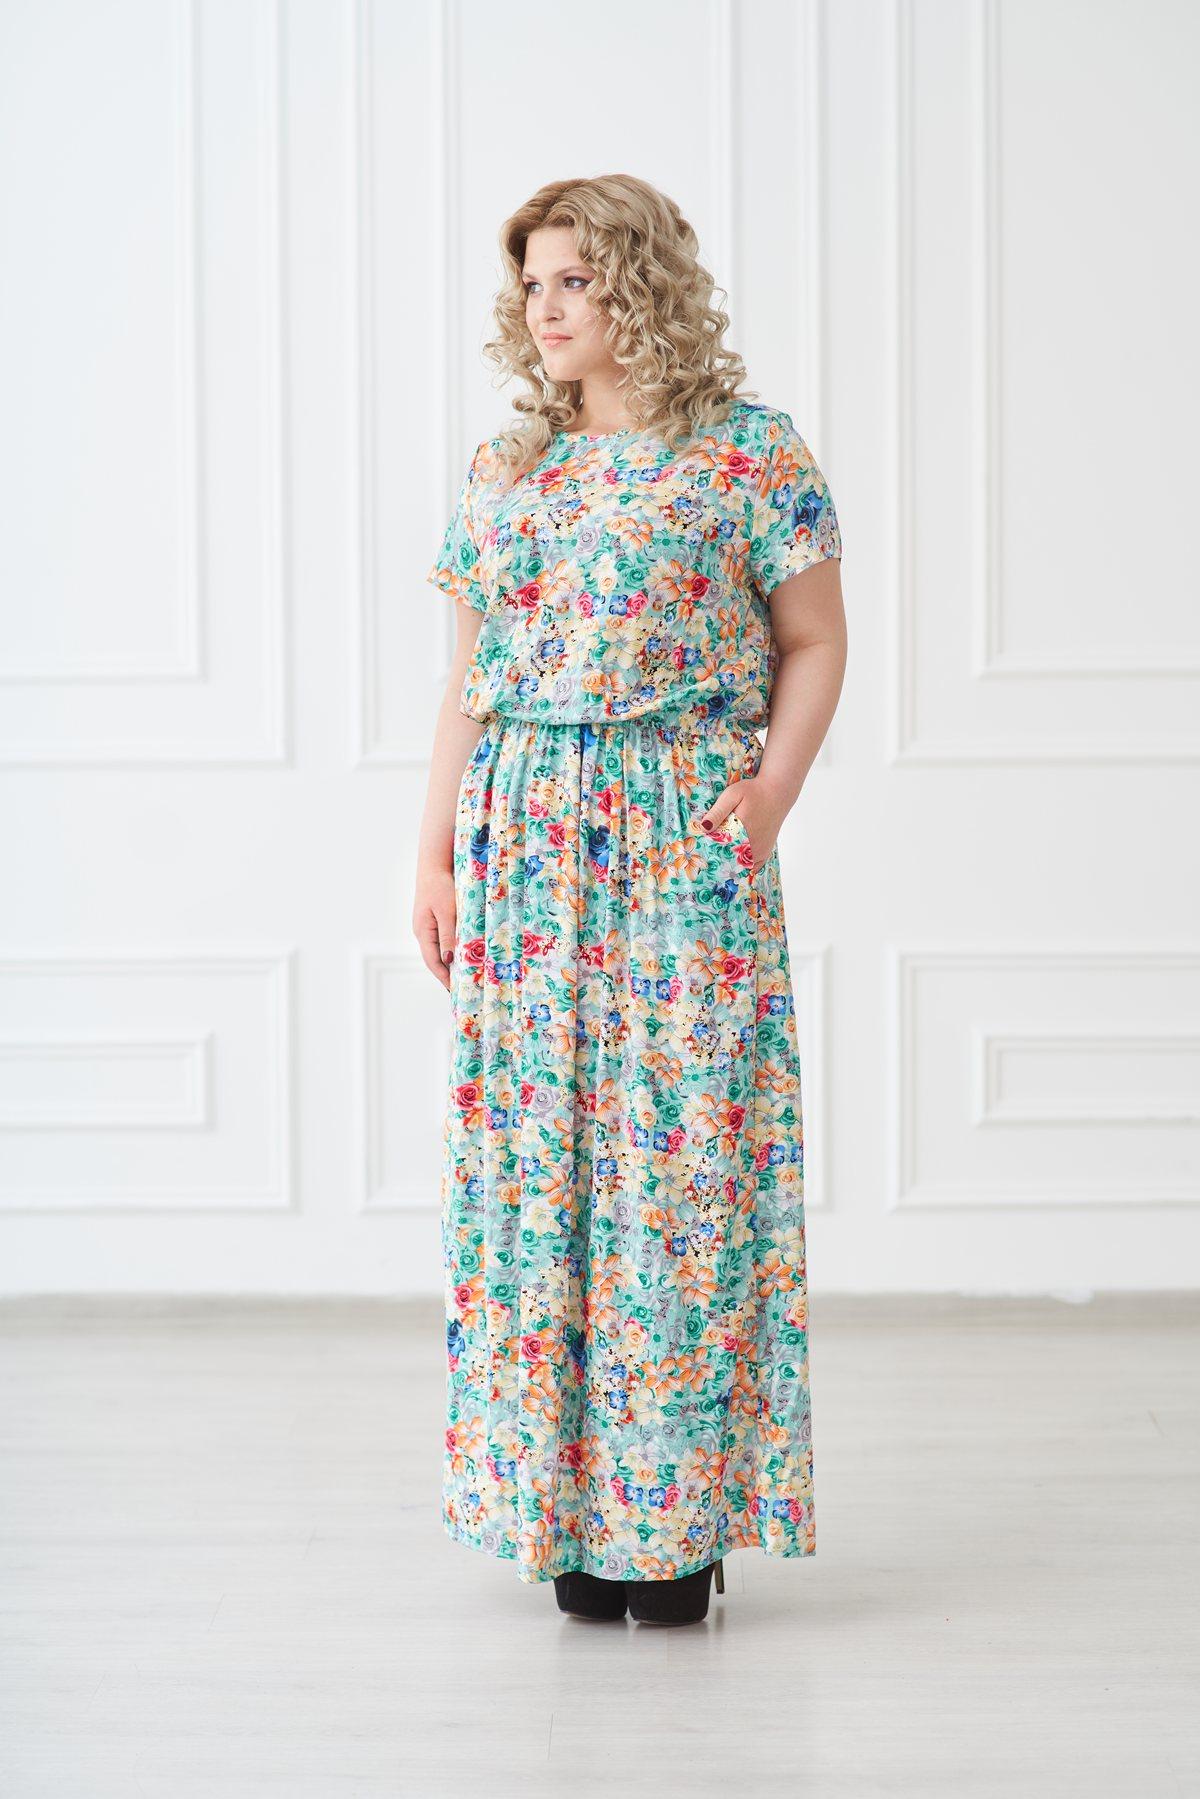 Жен. платье арт. 19-0140 Ментол р. 50Платья<br>Факт. ОГ: 110 см <br>Факт. ОТ: 78 см <br>Факт. ОБ: 138 см <br>Длина по спинке: 145 см<br><br>Тип: Жен. платье<br>Размер: 50<br>Материал: Штапель